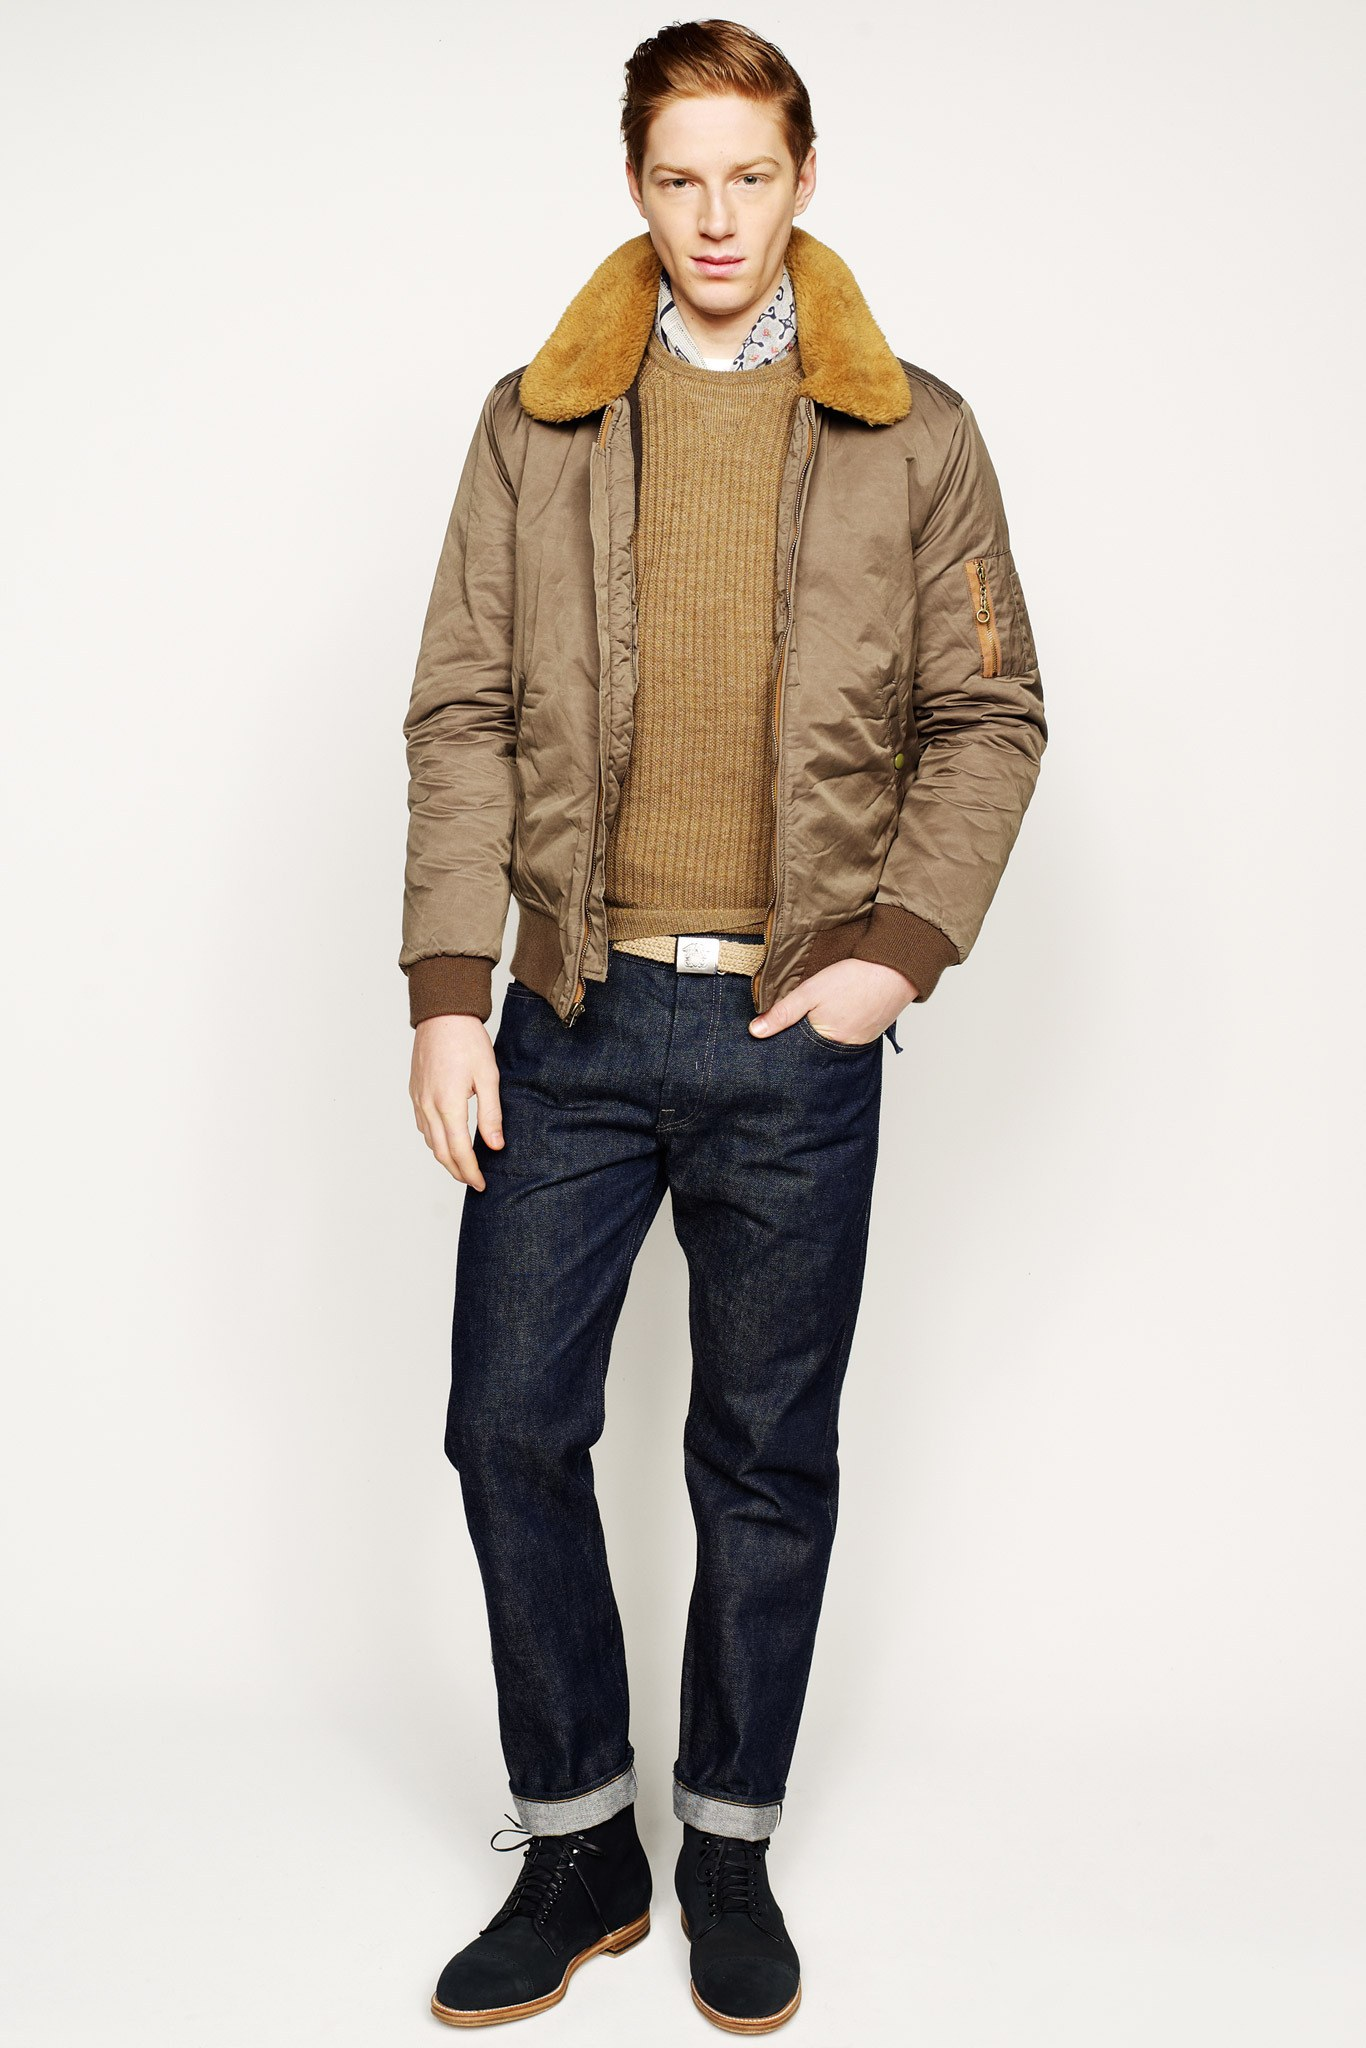 ELLE Man Style Calendar trẻ trung với vải dệt kim (11 – 712018) elleman 5